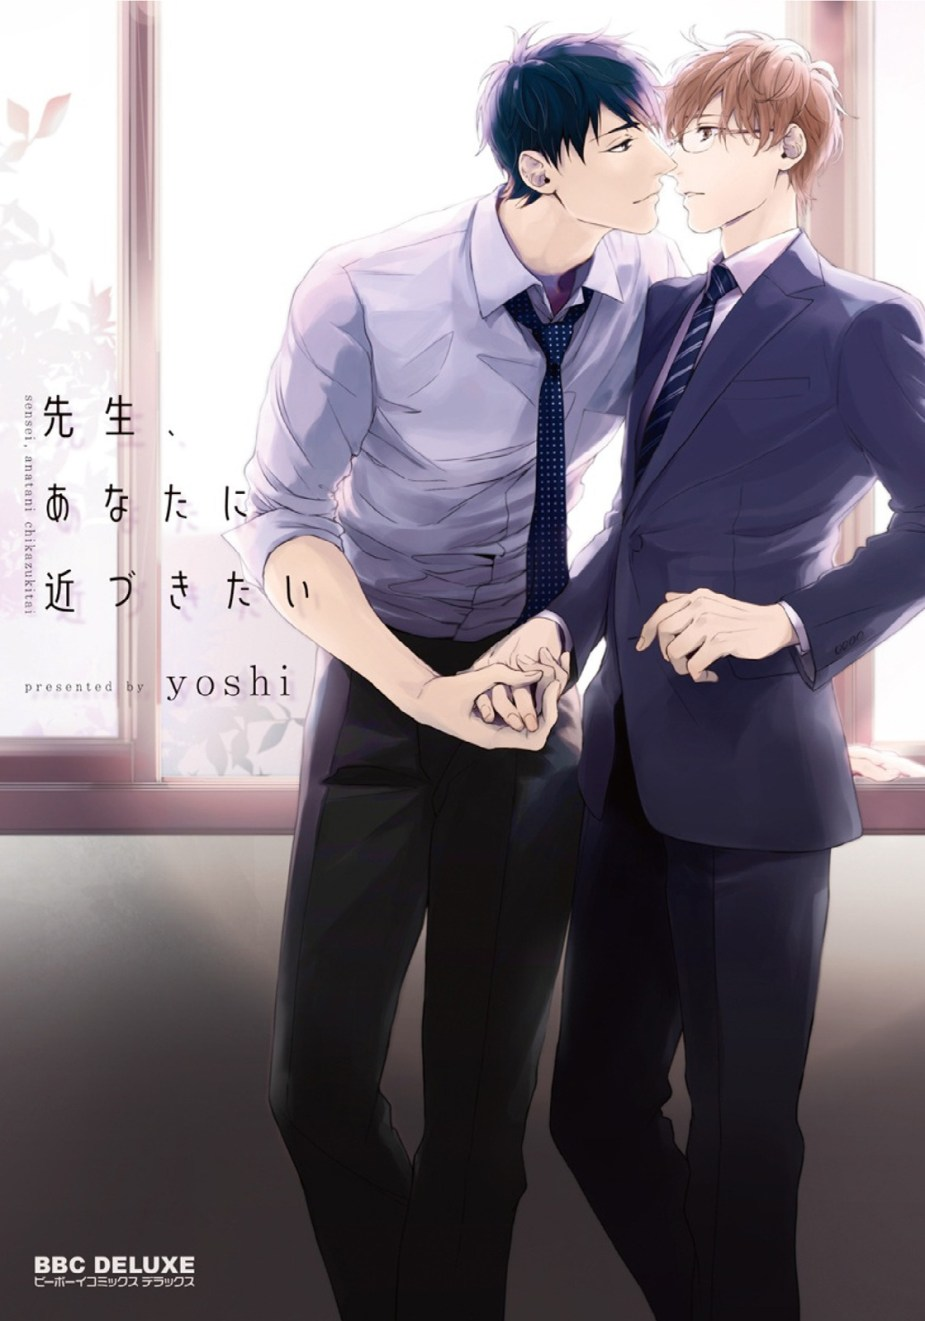 Sensei Anata ni Chikazukitai Cover